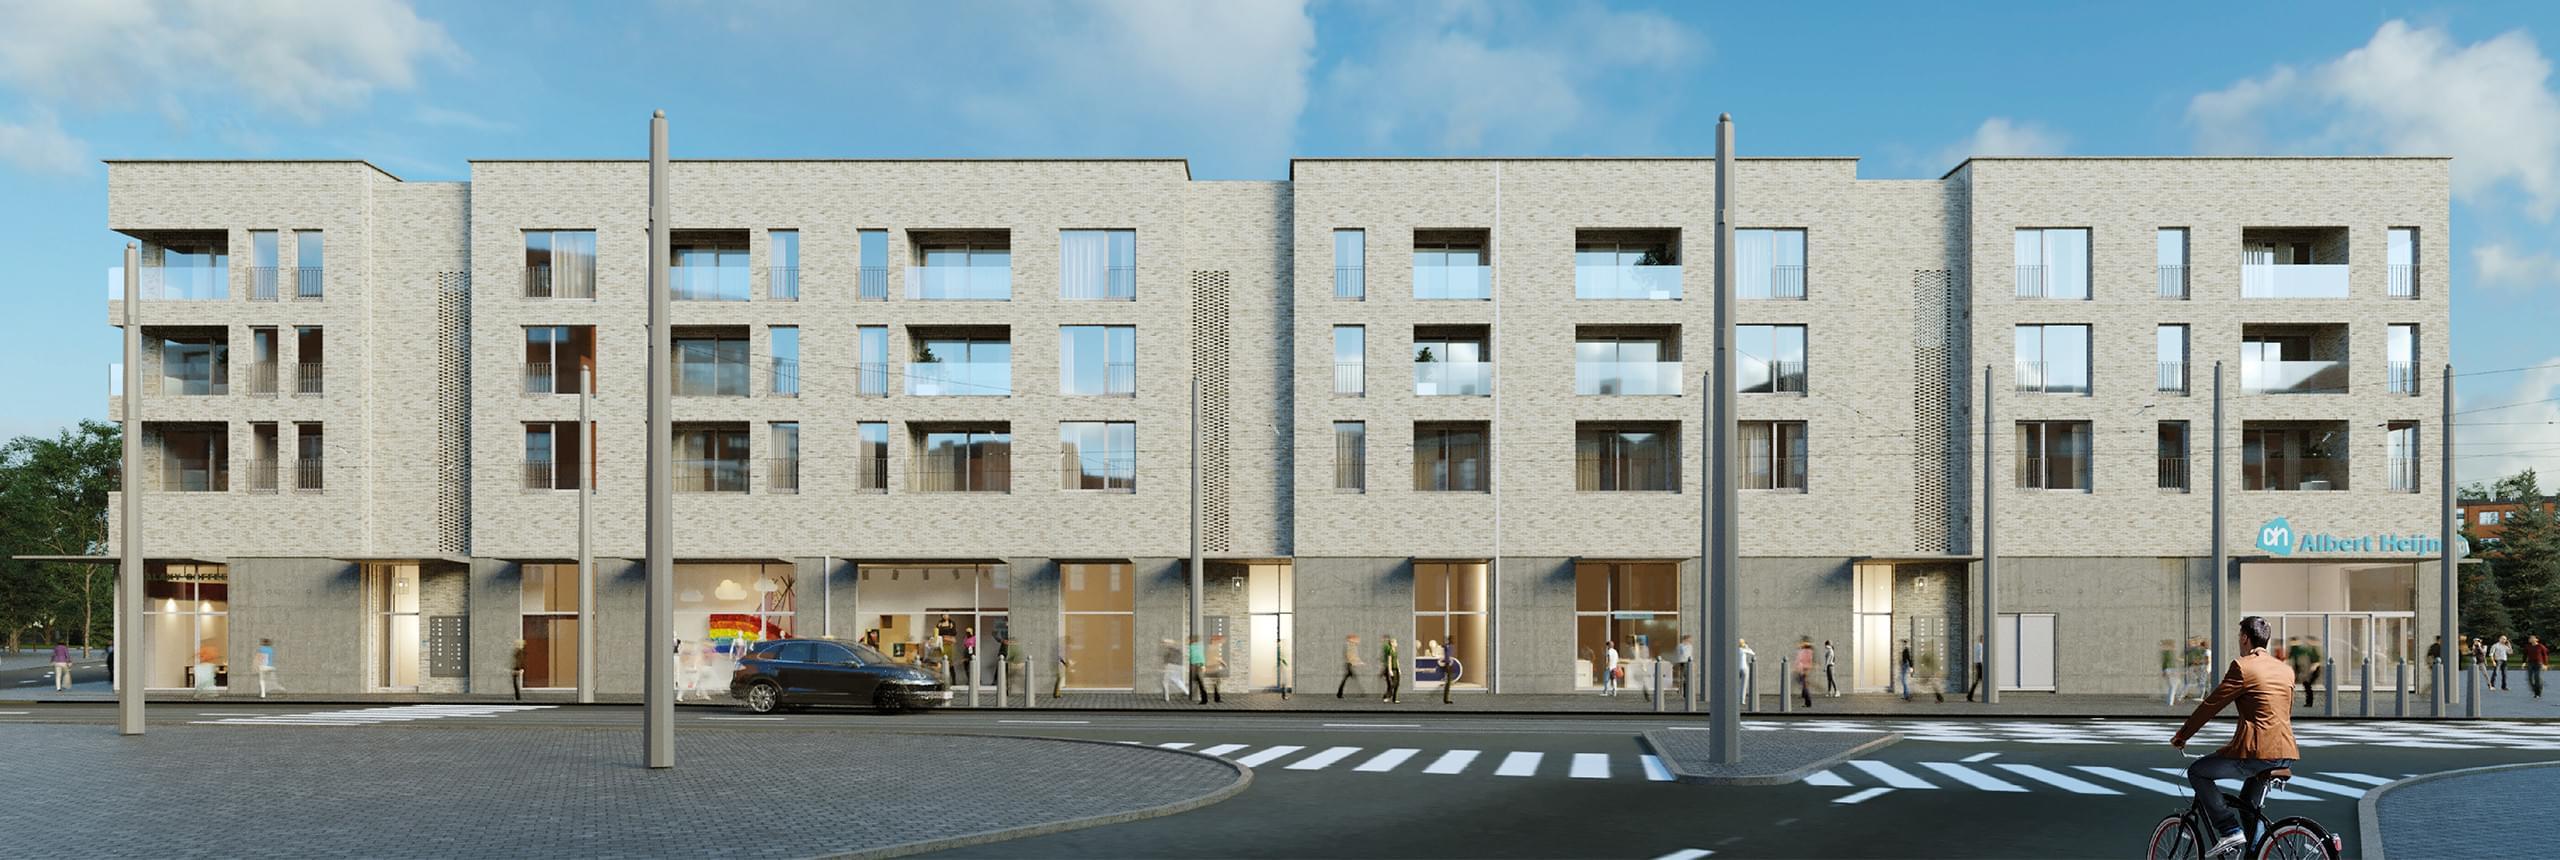 Silsburg Retour - B&R Development